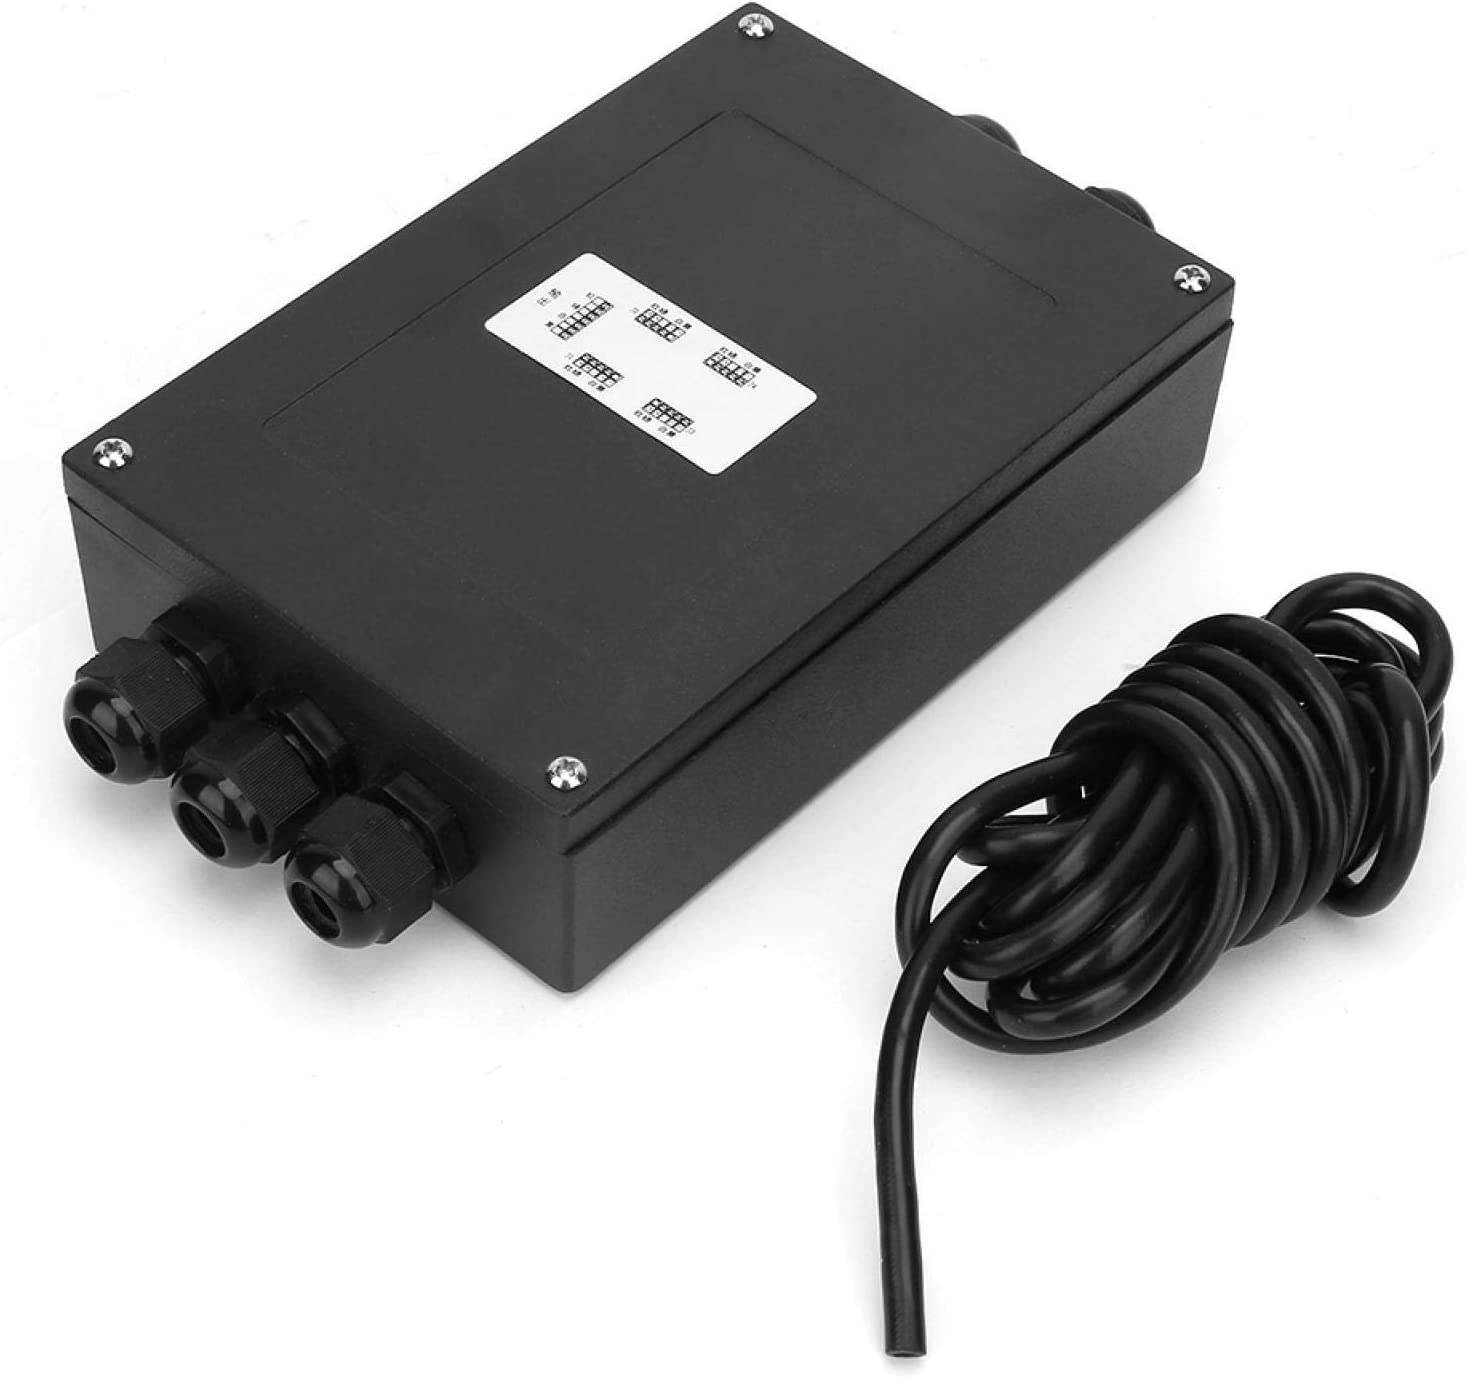 Overseas parallel import regular item Miskall Weighing Sensor Transmitter Amplifier Cell Wei Philadelphia Mall